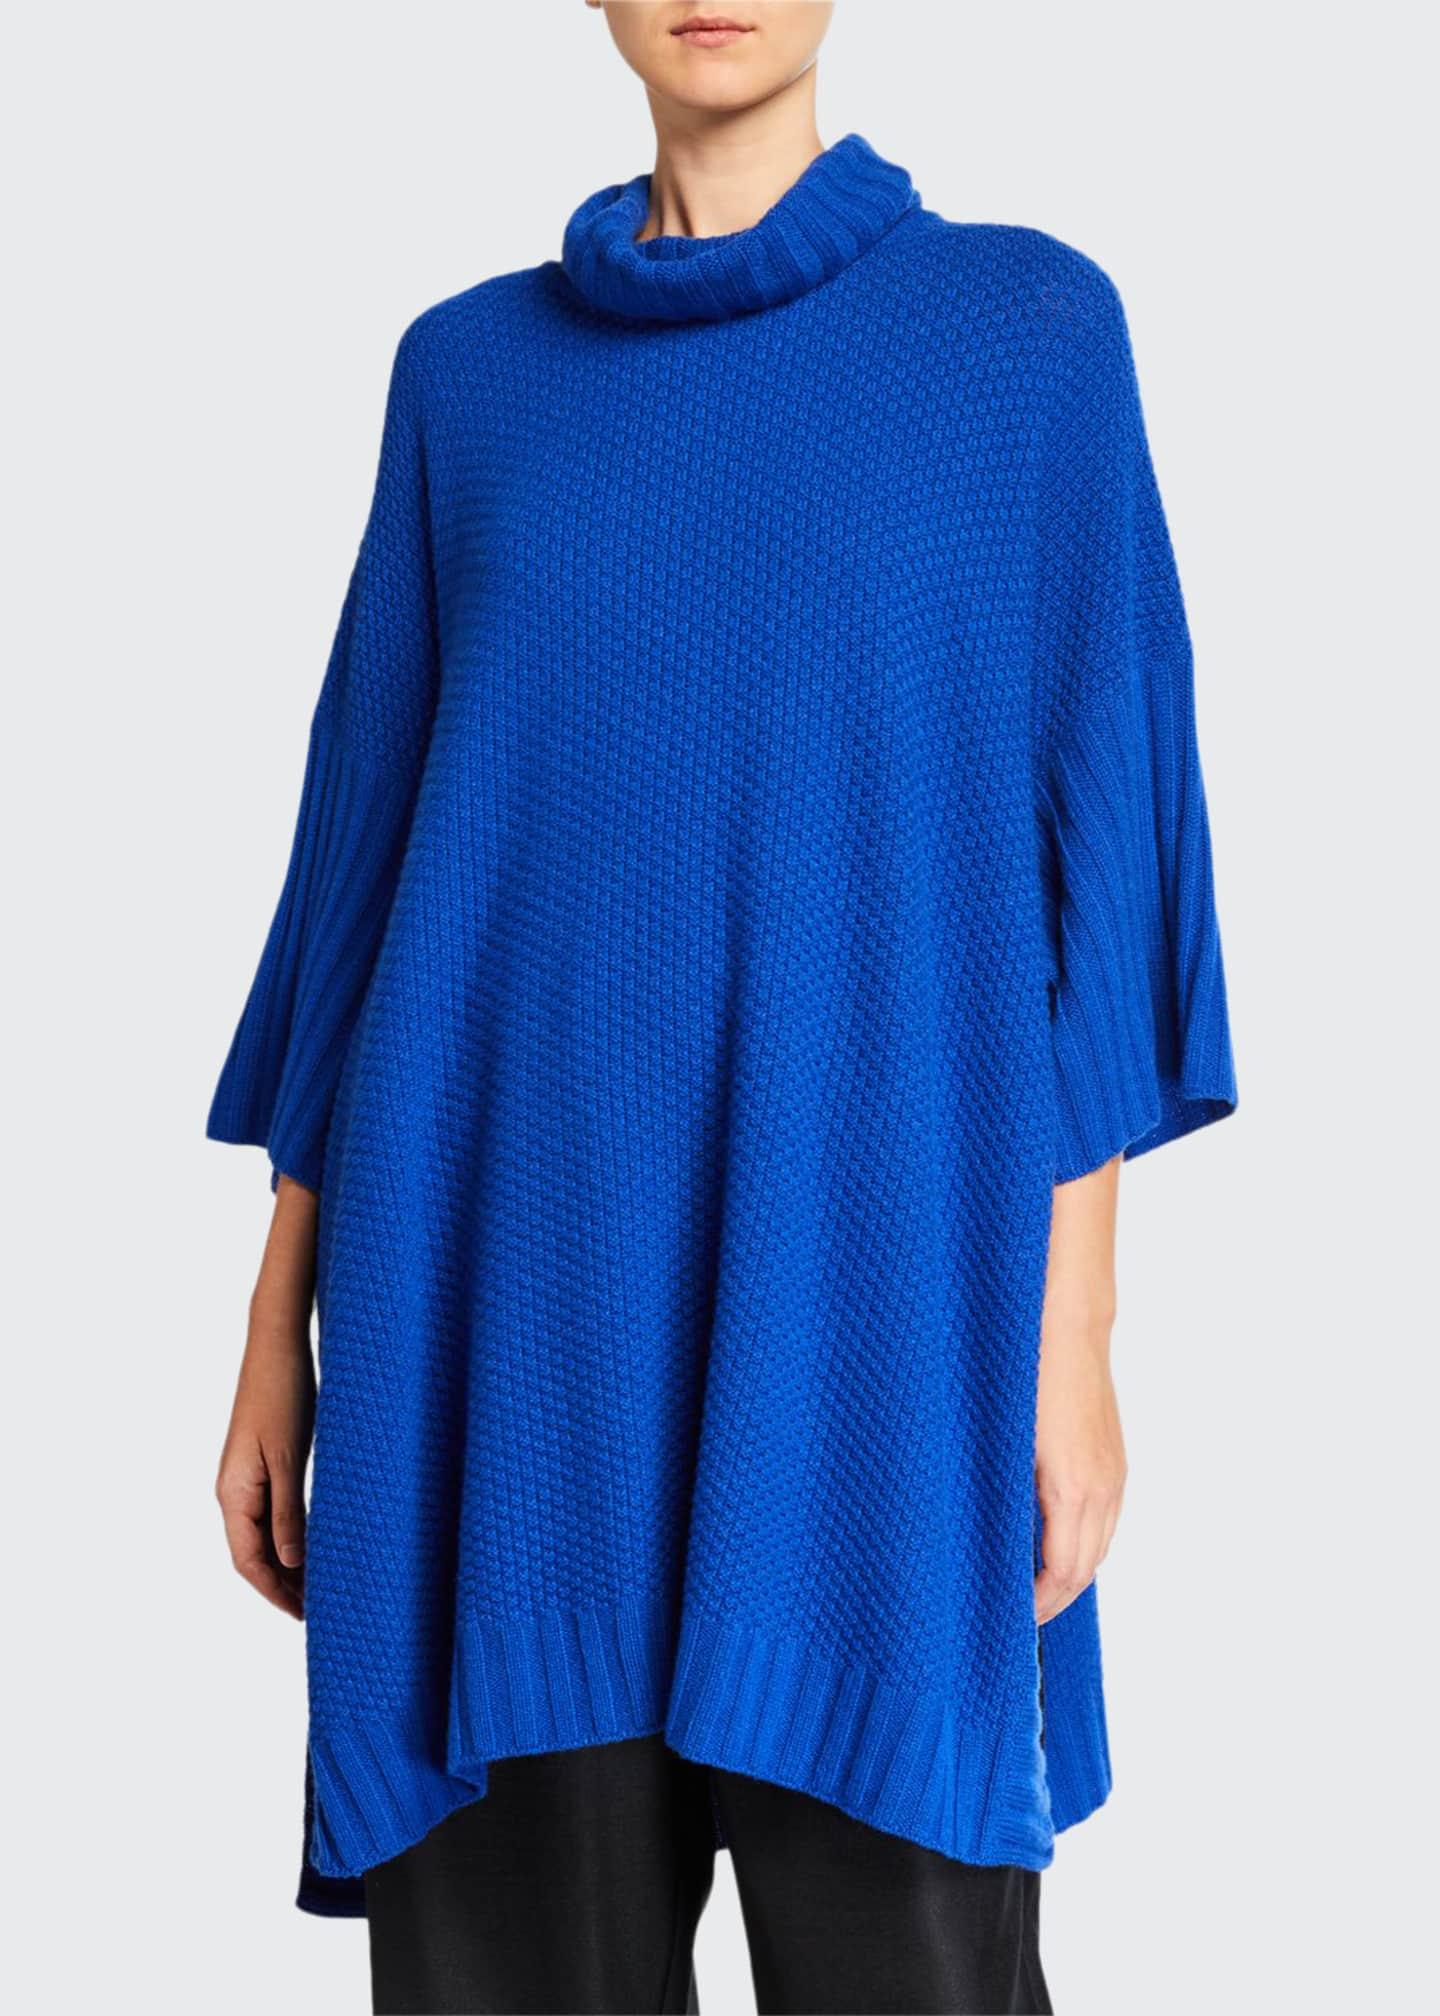 Eskandar 3/4-Sleeve Roll-Neck Poncho Sweater